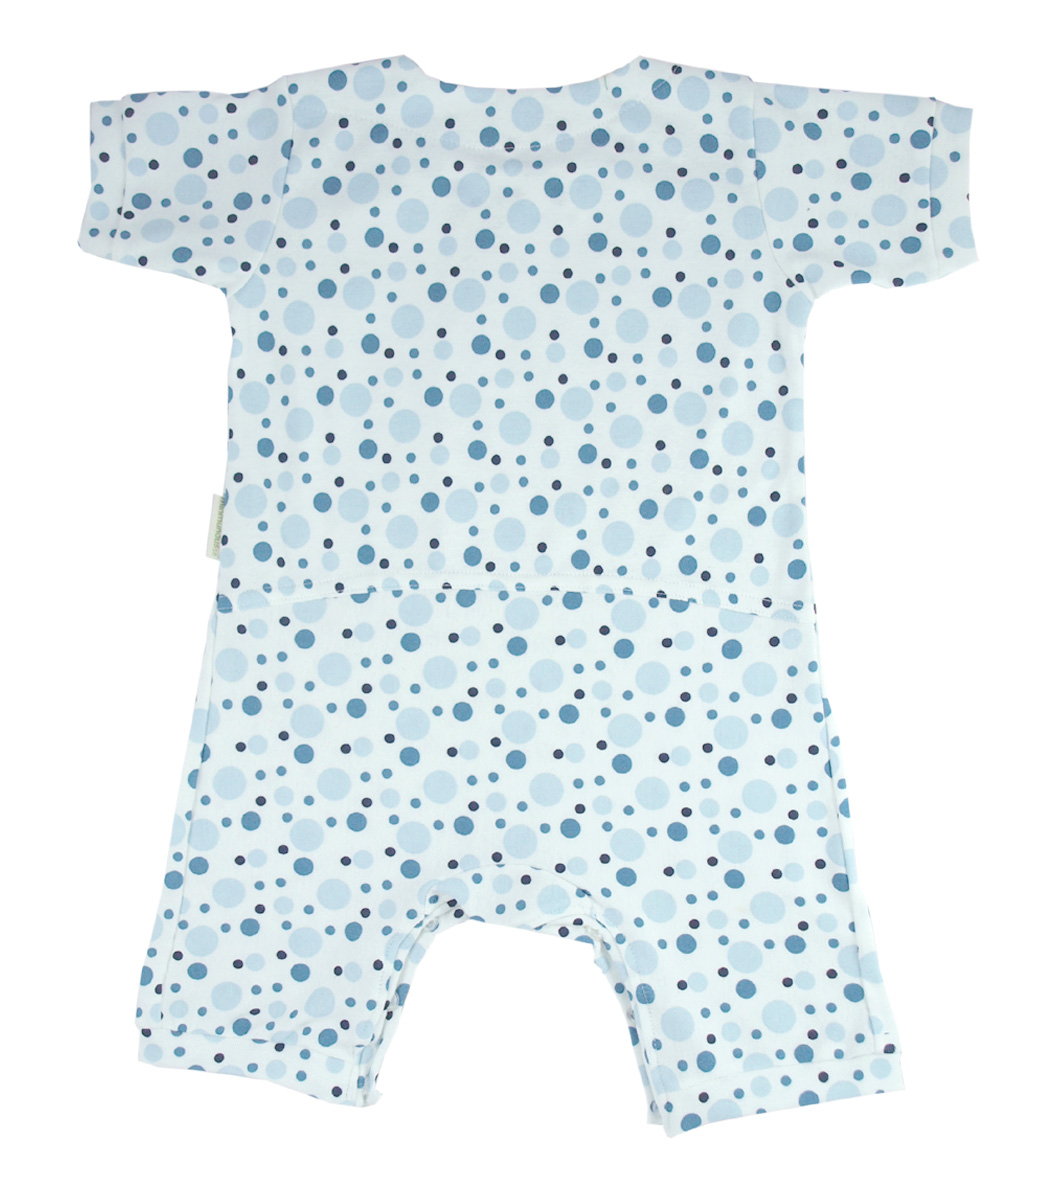 Minimundus jumpsuit romper 100% ekologisk bomull blå prickar